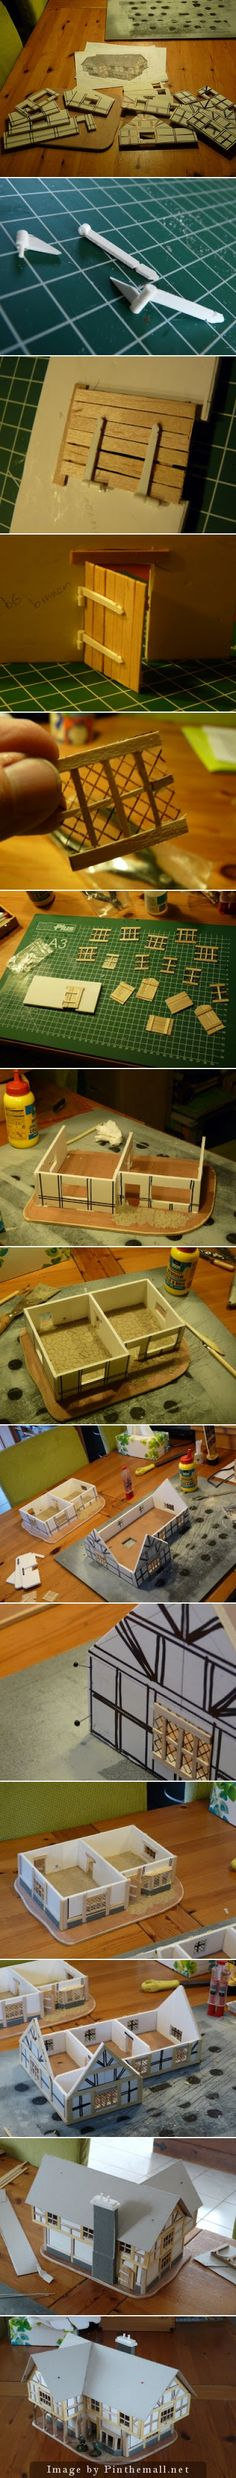 http://pijlieblog.blogspot.it/2012/03/building-tavern-part-1.html - created via http://pinthemall.net